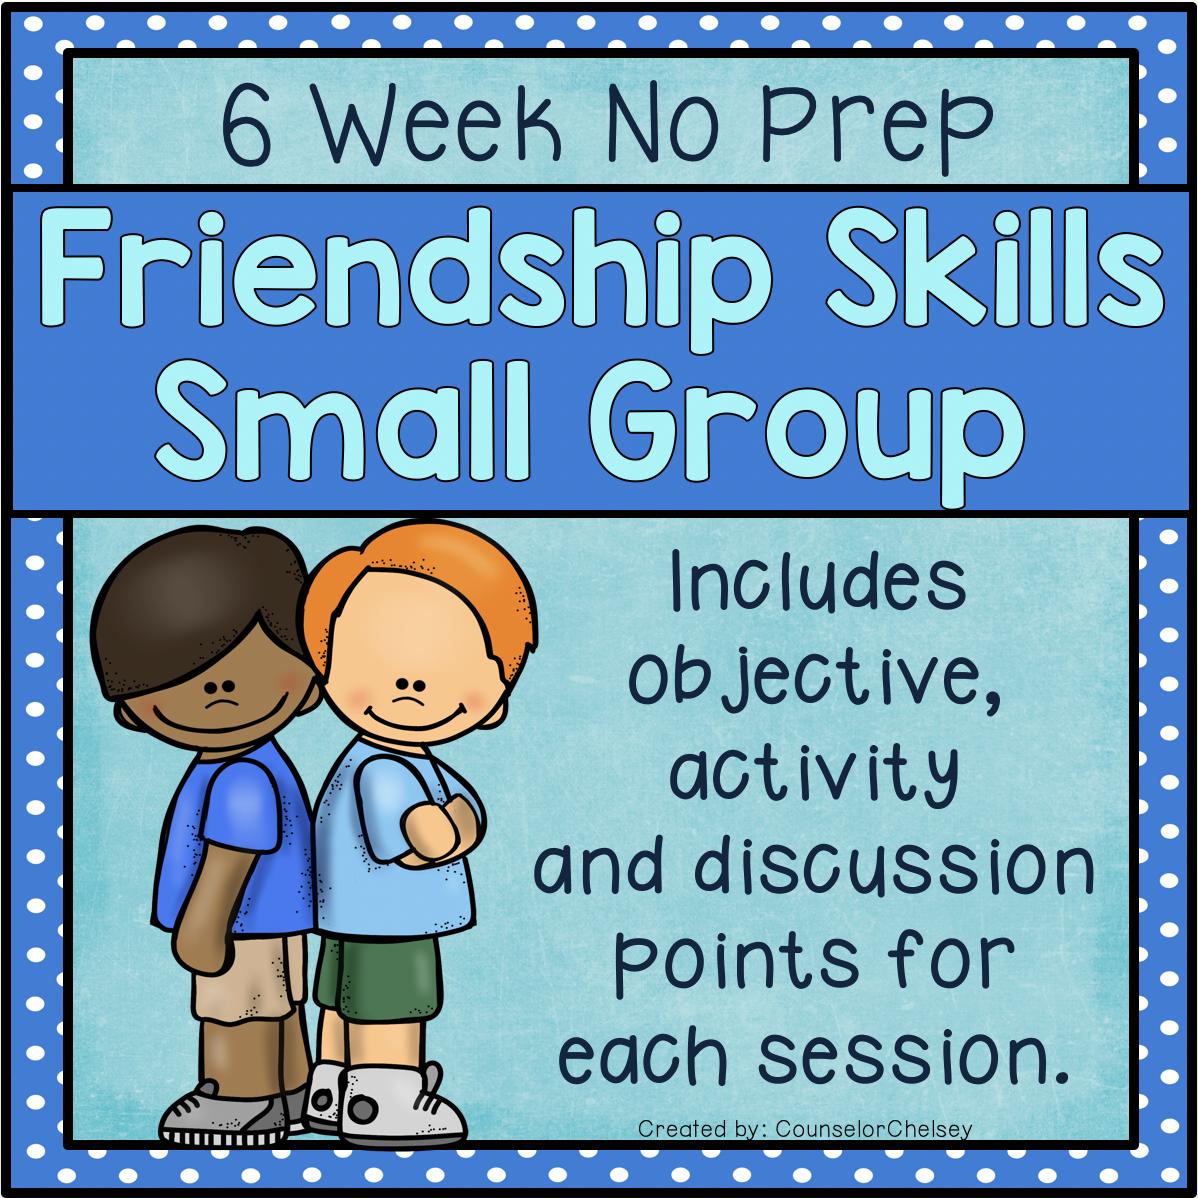 Friendship Skills Small Group